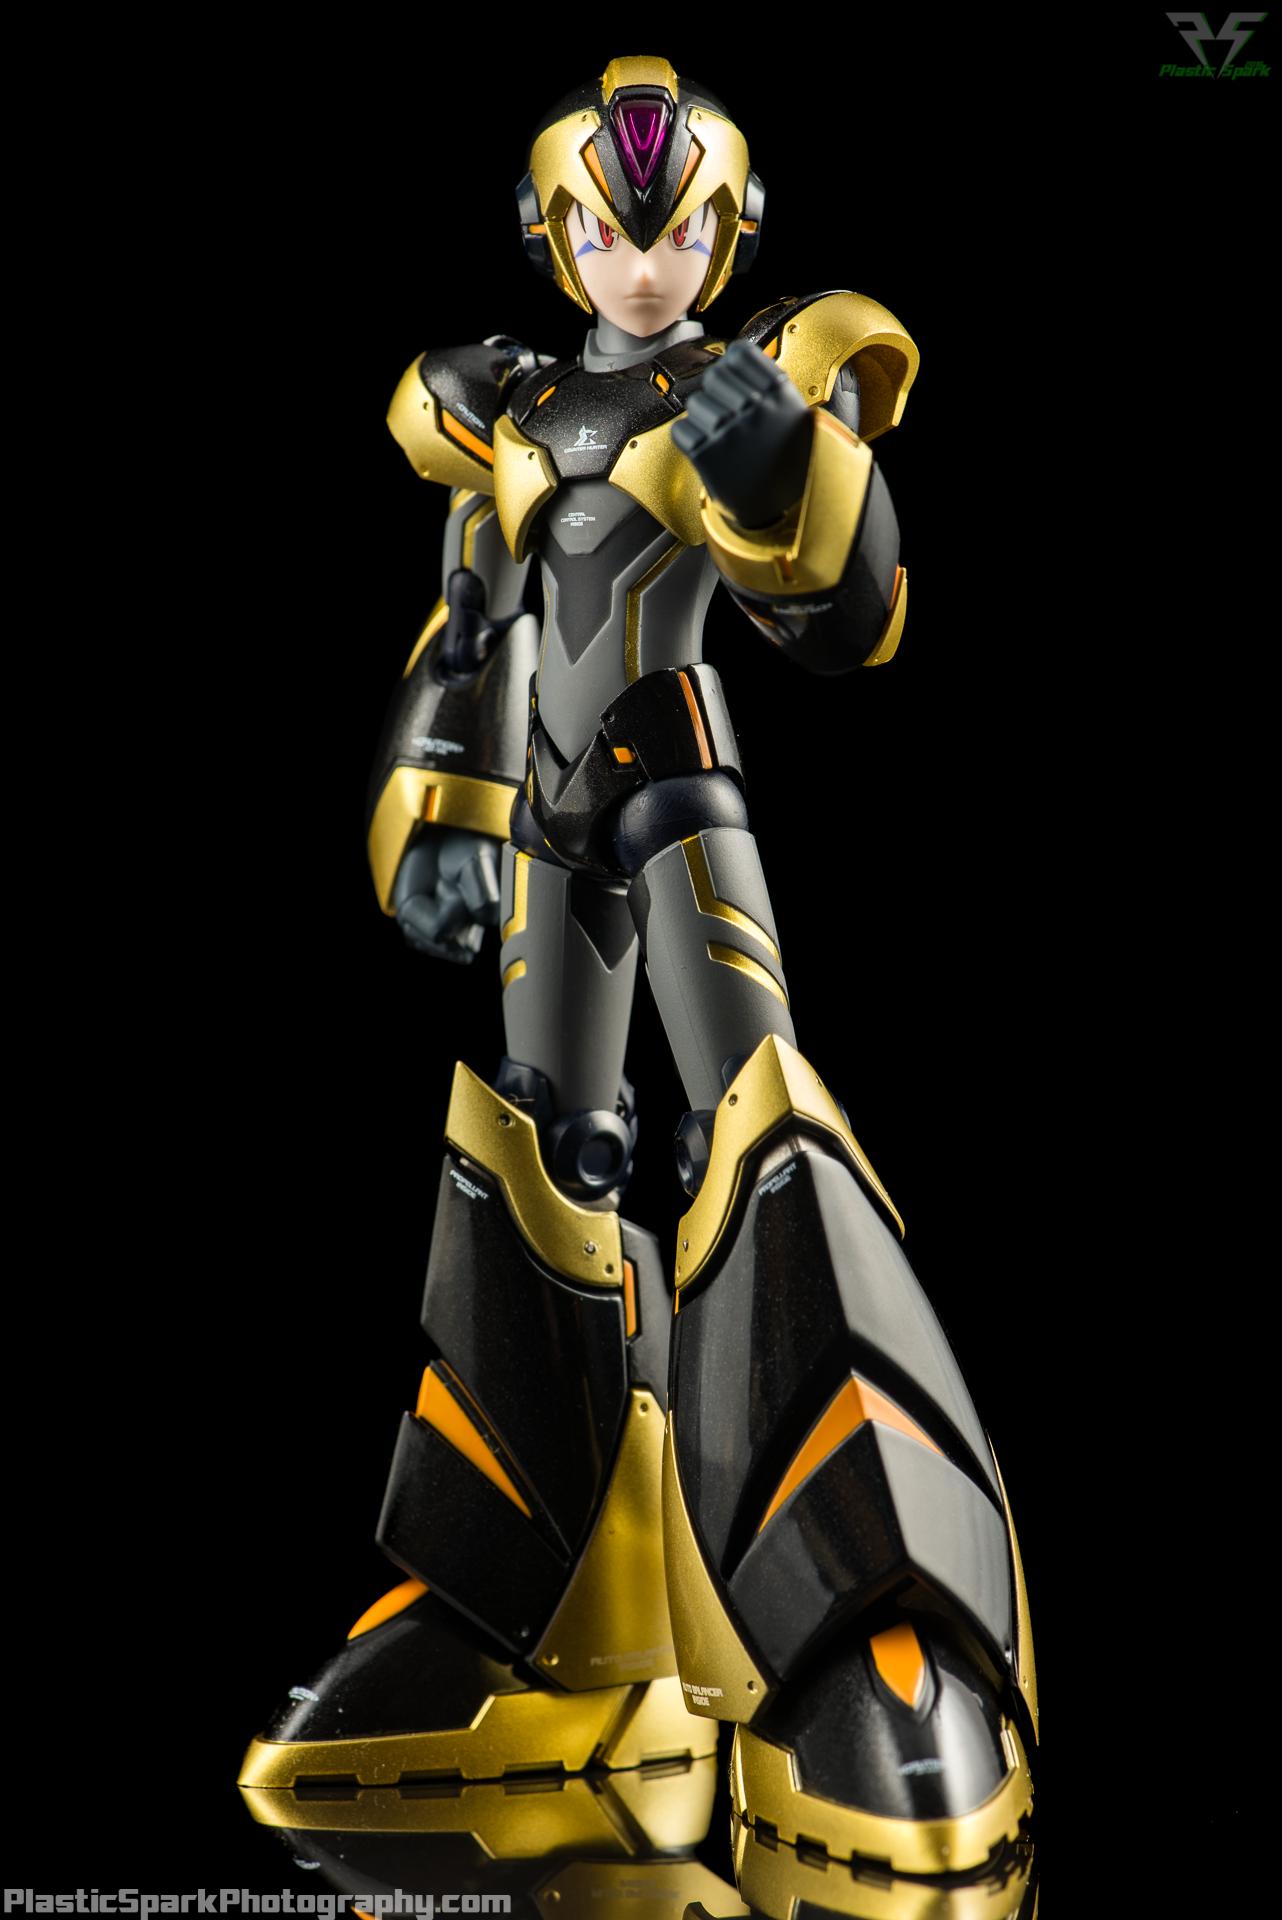 Truforce-Megaman-X-Kai-(1-of-7).png